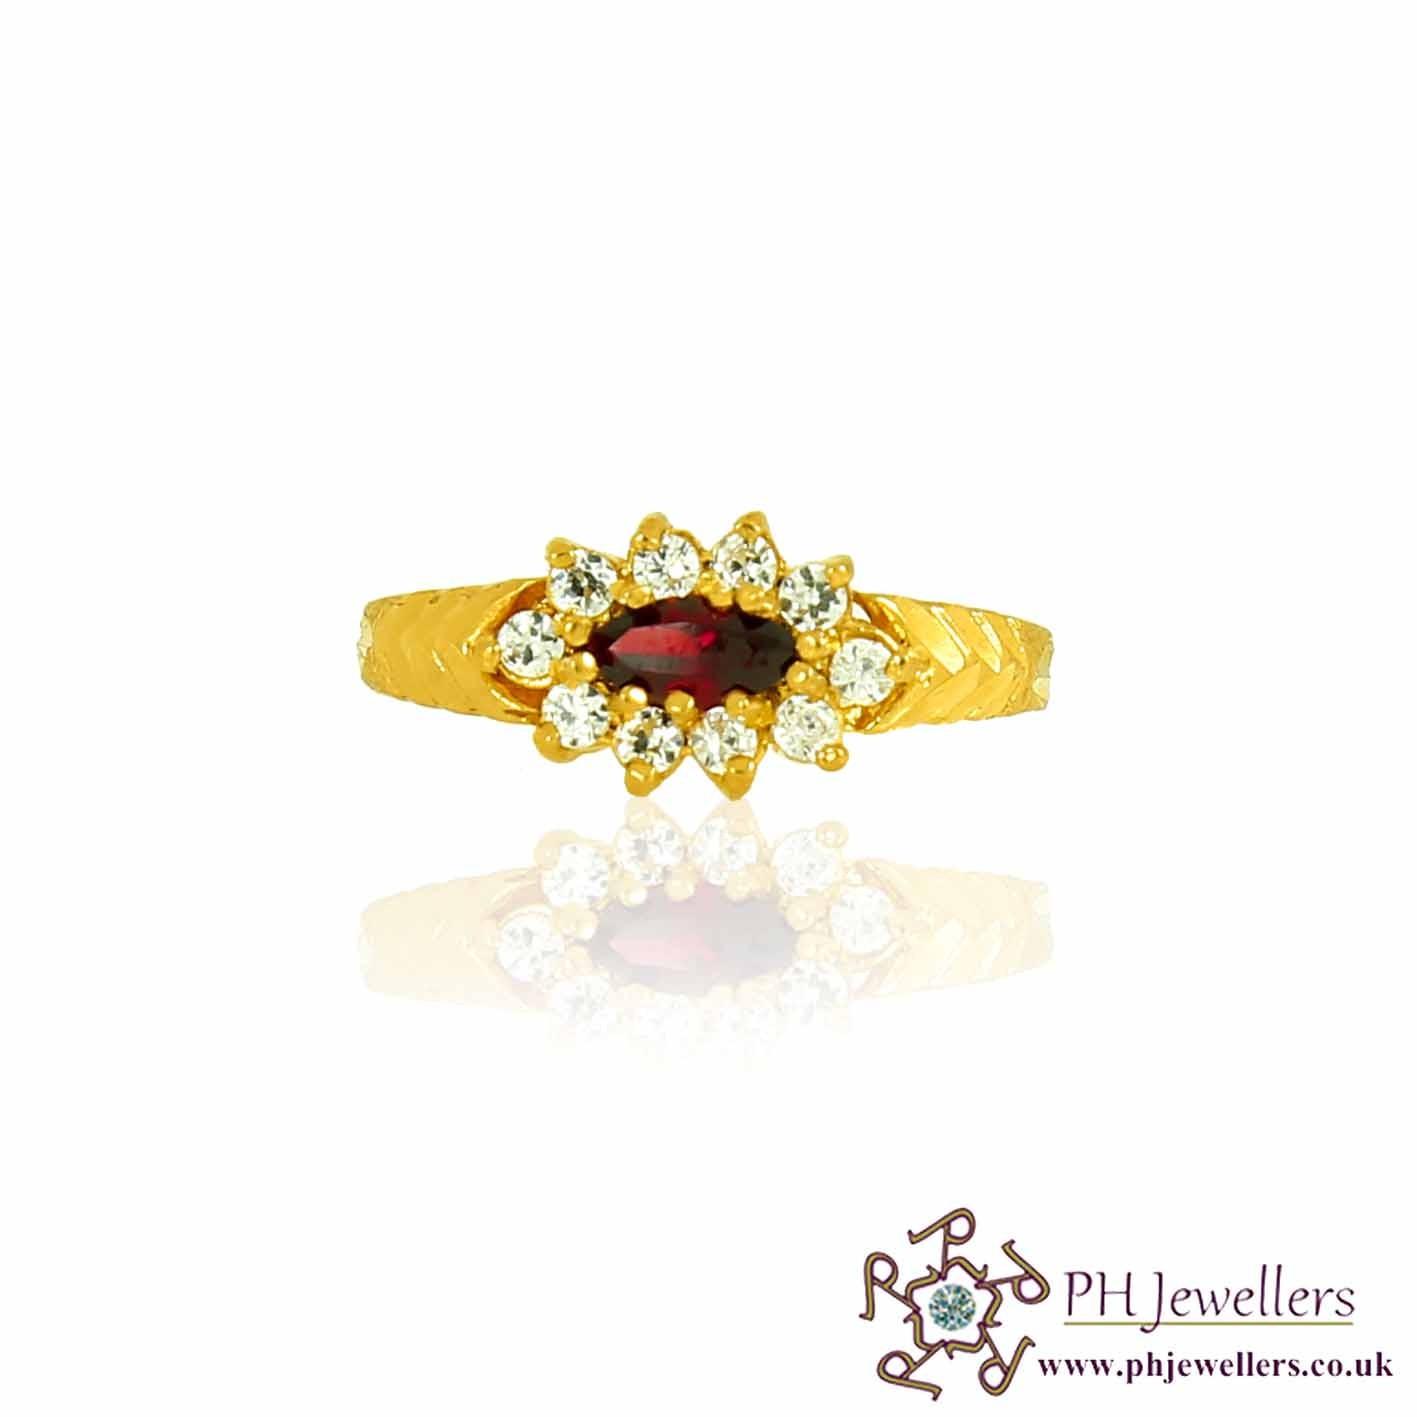 22ct 916 Hallmark Yellow Gold Garnet Size K,L Ring CZ SR83